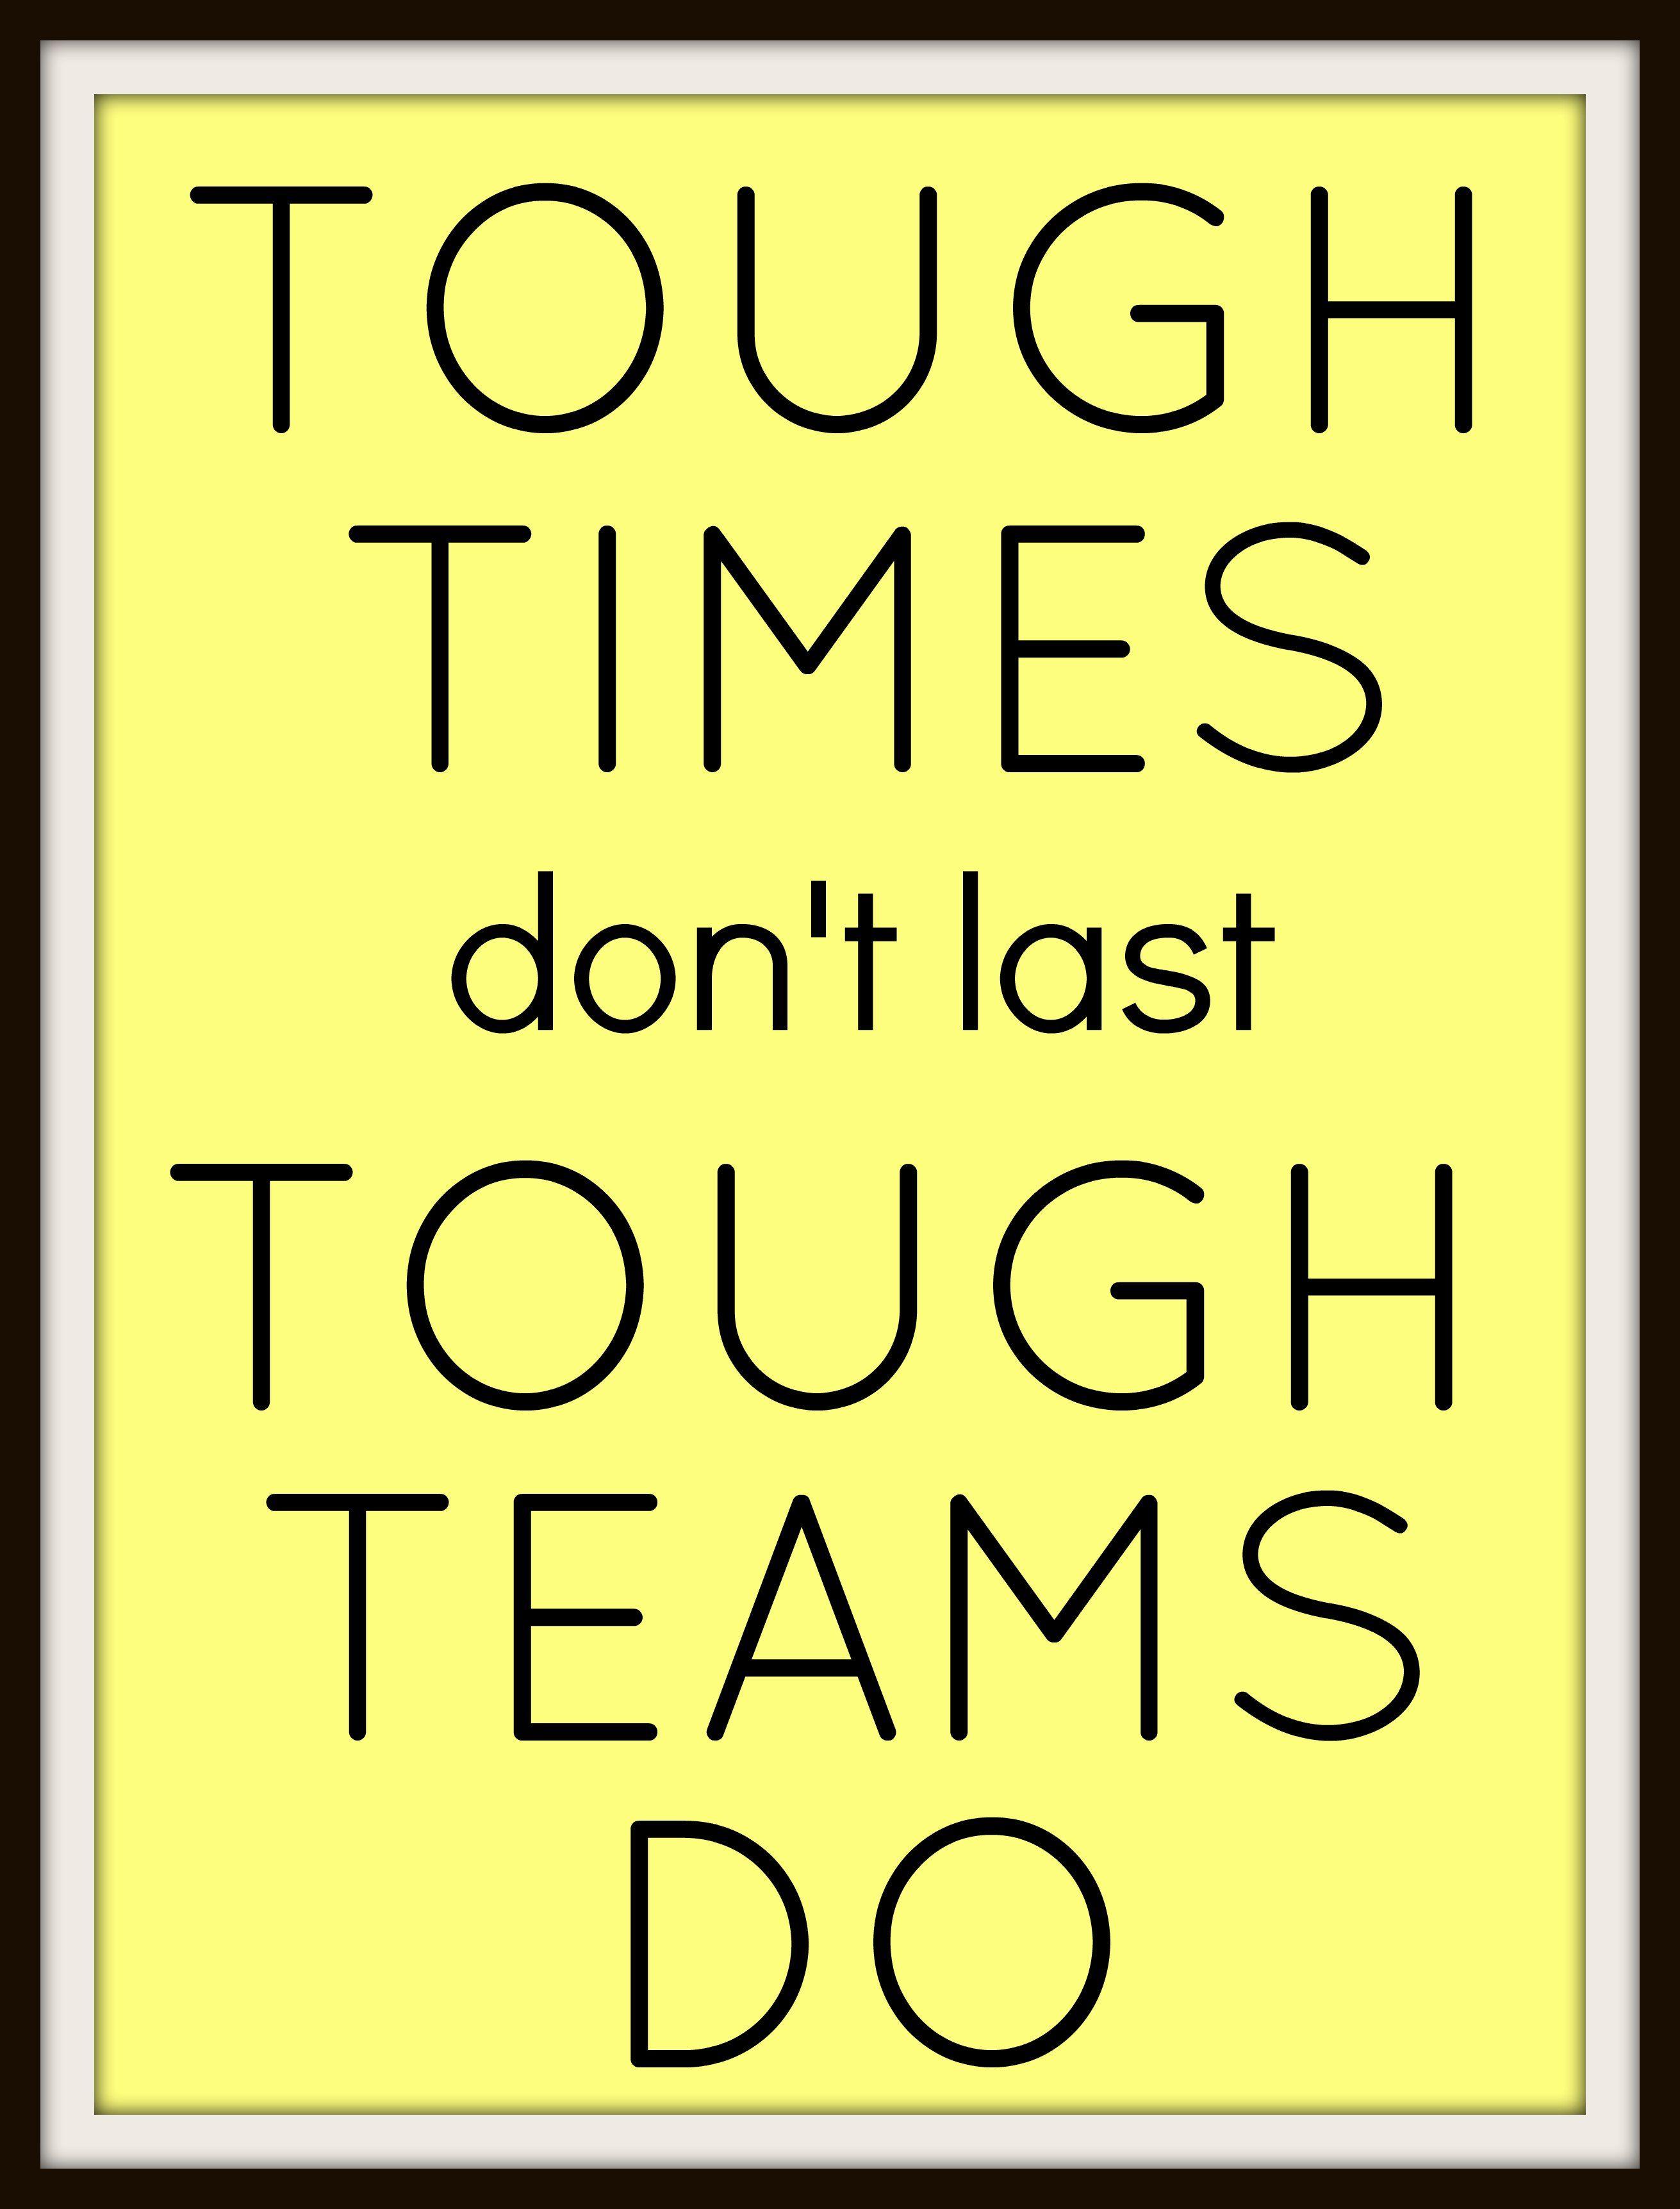 Team Motivation Art For Your Office 5 Best Teamwork Quotes Team Building Quotes Teamwork Quotes